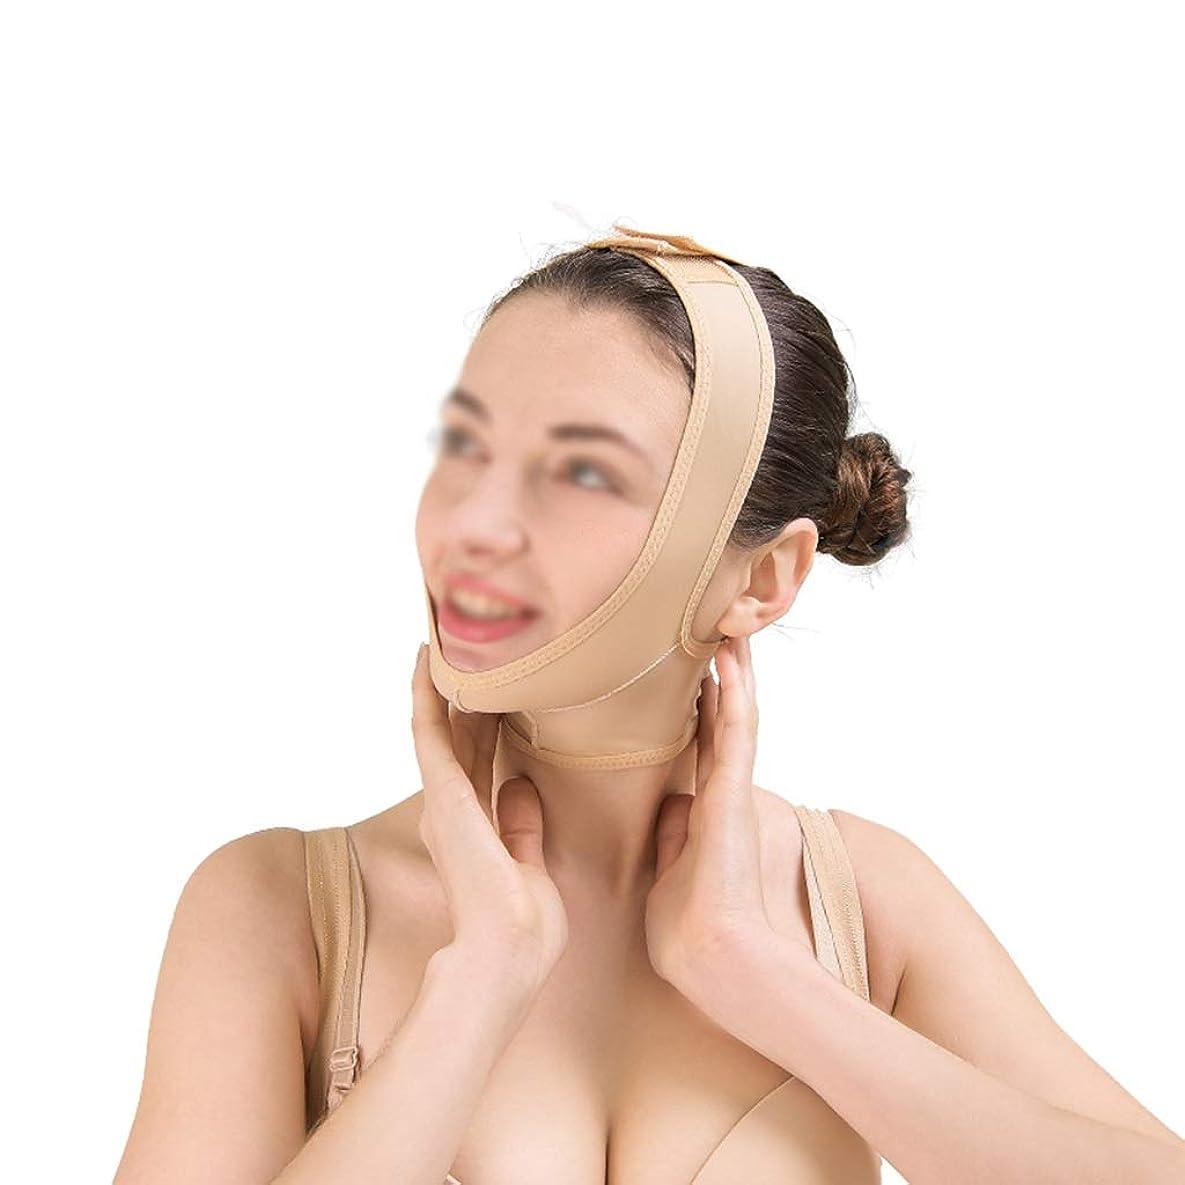 XHLMRMJ 二重あごのストラップ、包帯を持ち上げる、持ち上がると肌の包帯を引き締める、通気性のフェイスマスク、快適で通気性のある顔の持ち上がるマスク (Size : XL)